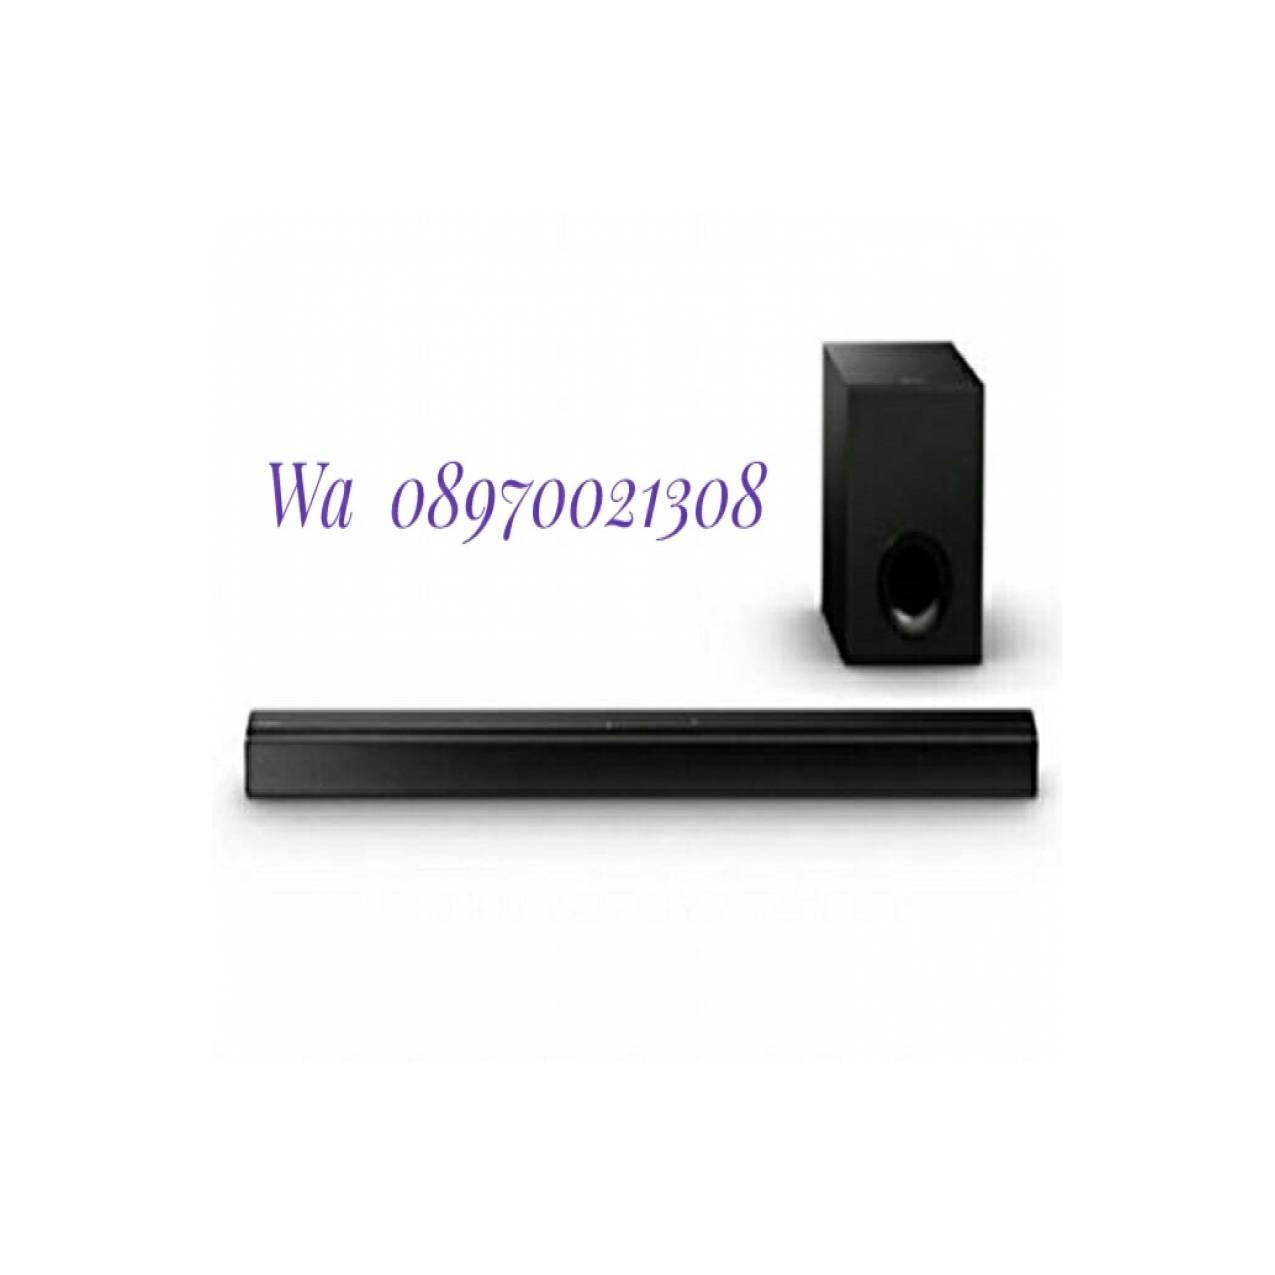 Ini Harga Home Theater Sony Davtz140 Murah Di Update November Polytron Dtib 3500 System Hitam Soundbar Speaker 21 Chanel Bluetooth Ht Ct80